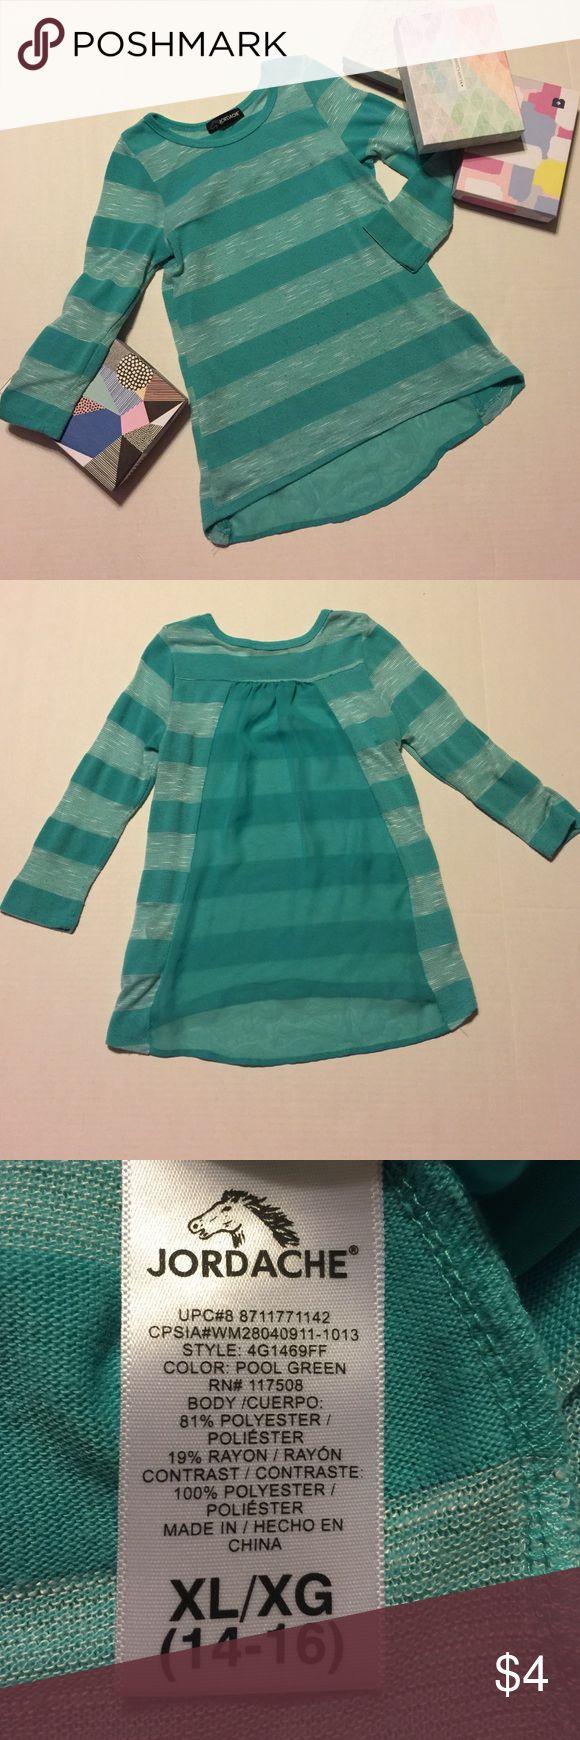 Turquoise girls long sleeve shirt. Size 14/16 Jordache girls long sleeve turquoise shirt. Size 14/16. Worn condition. Color still vibrant. Jordache Shirts & Tops Tees - Long Sleeve